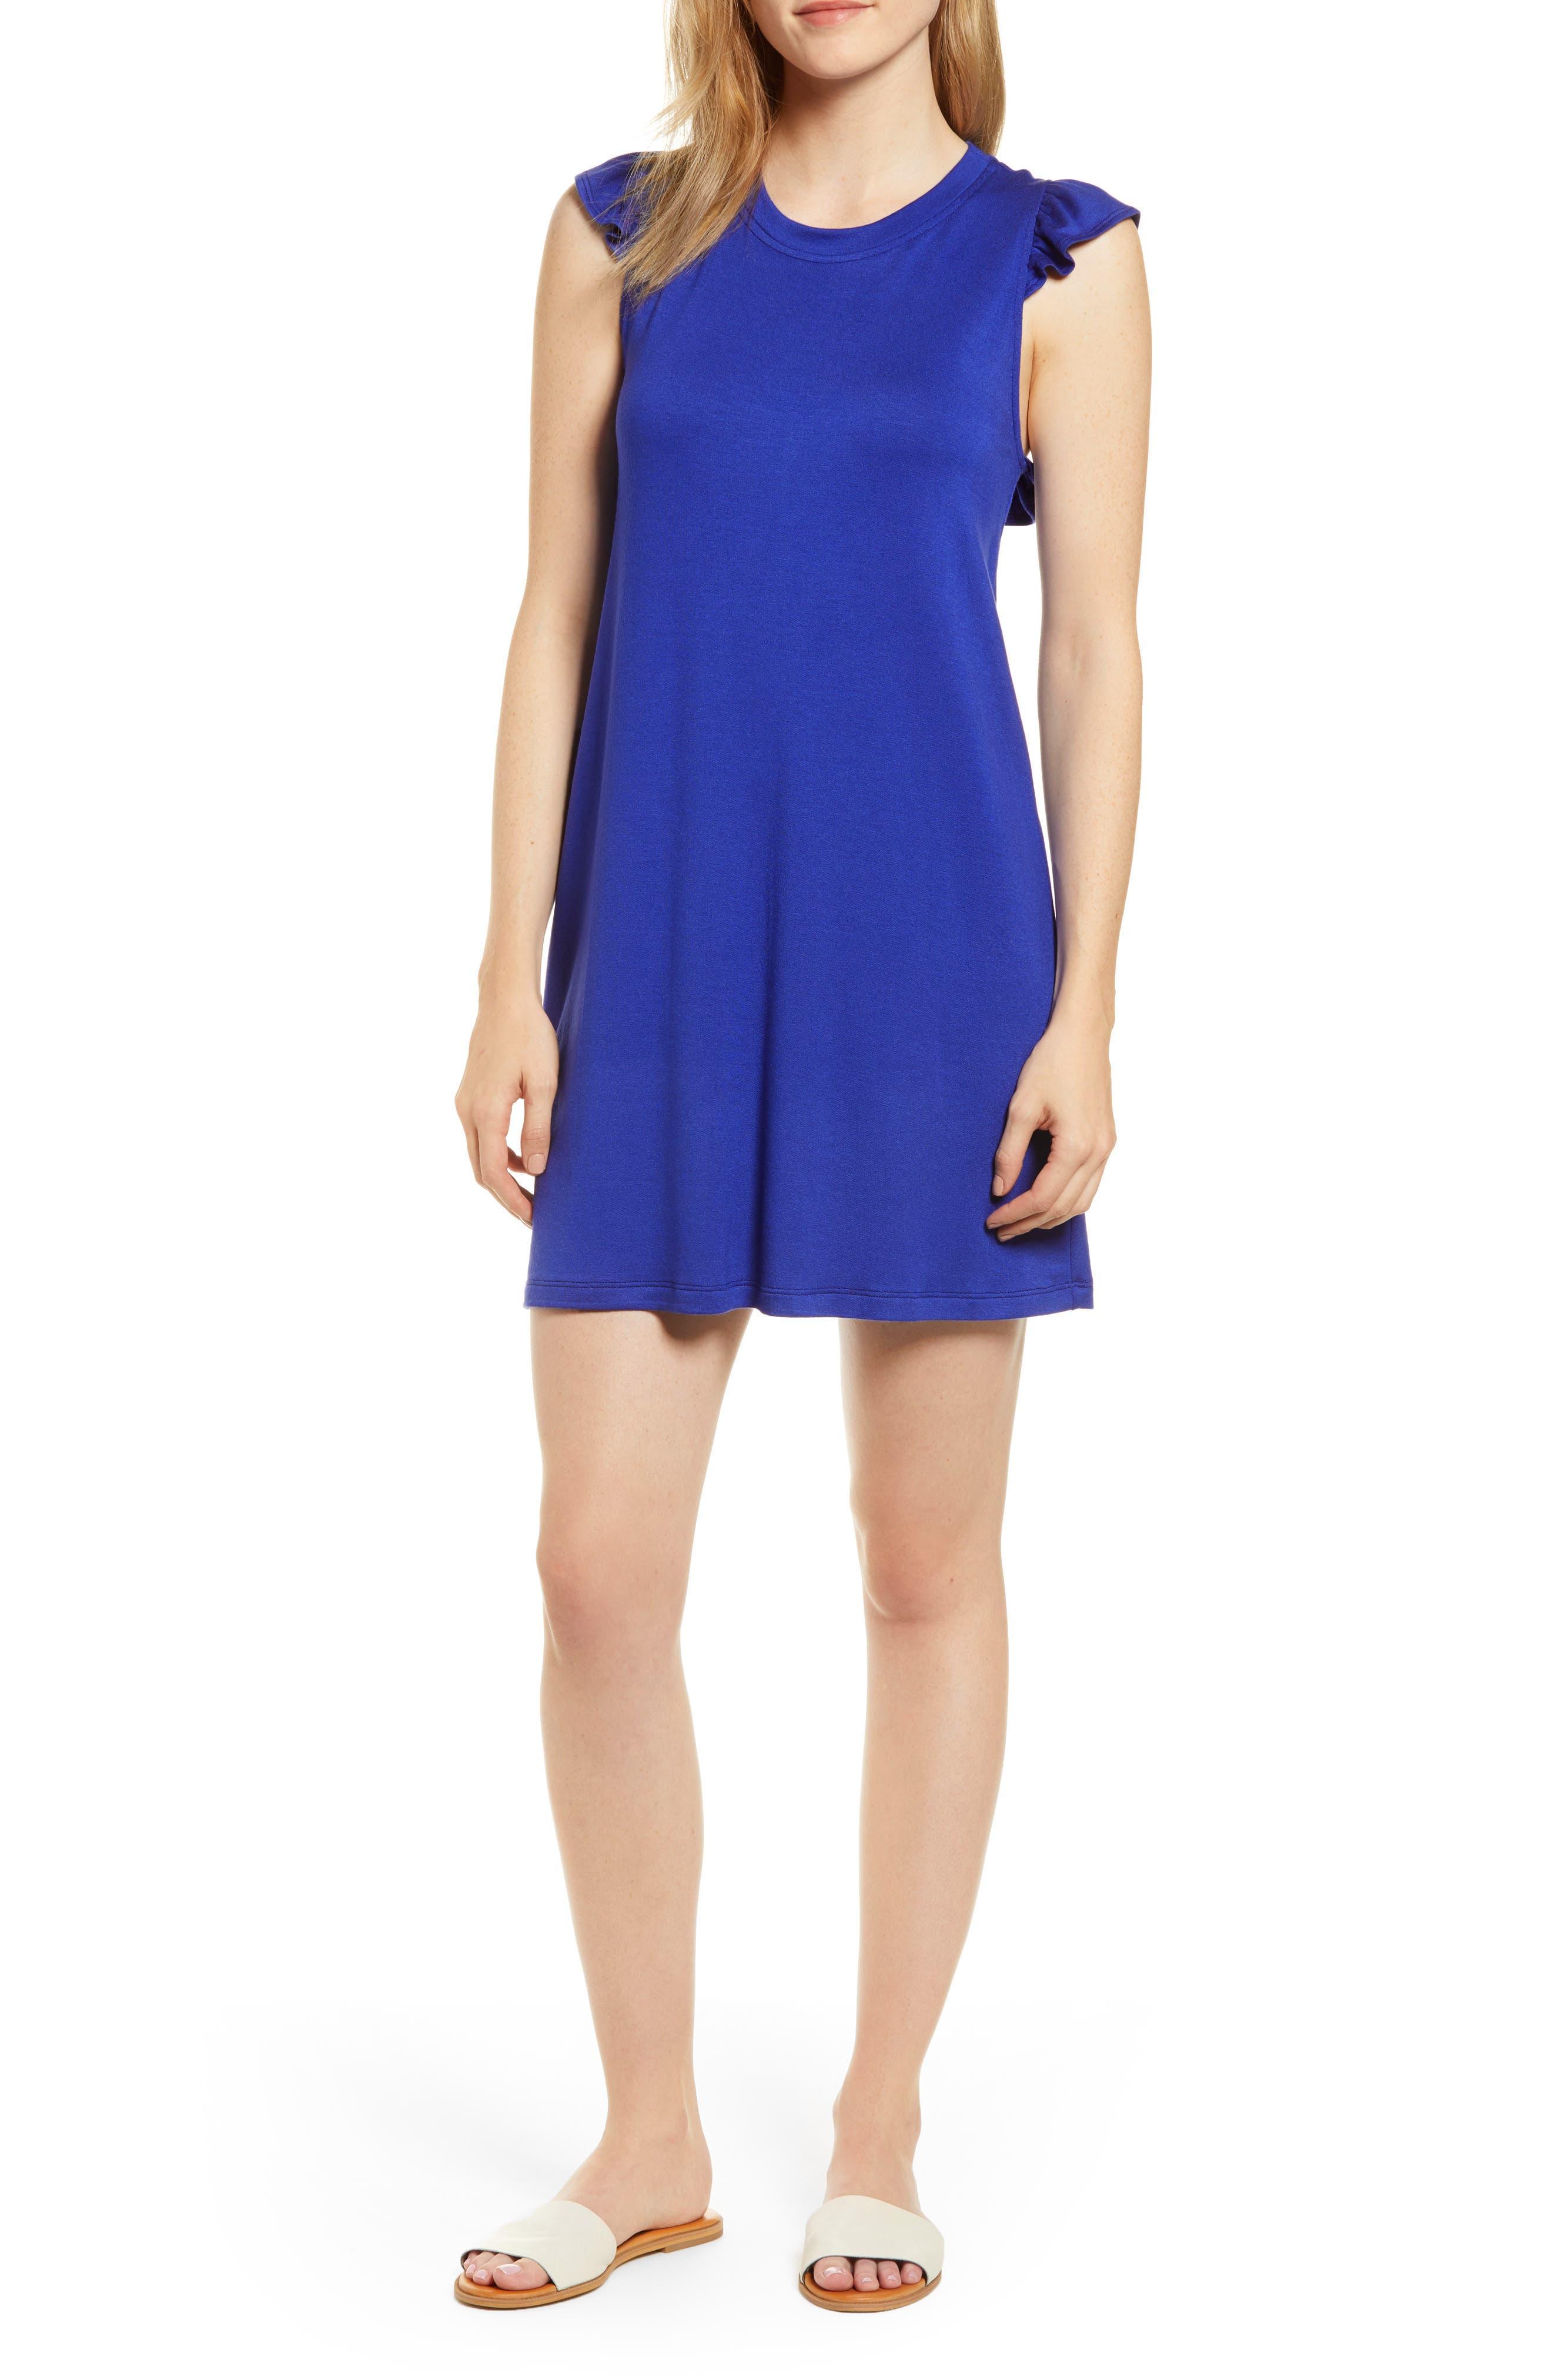 Petite Gibson X Hi Sugarplum! Laguna Soft Jersey Ruffle Back T-Shirt Dress, Blue